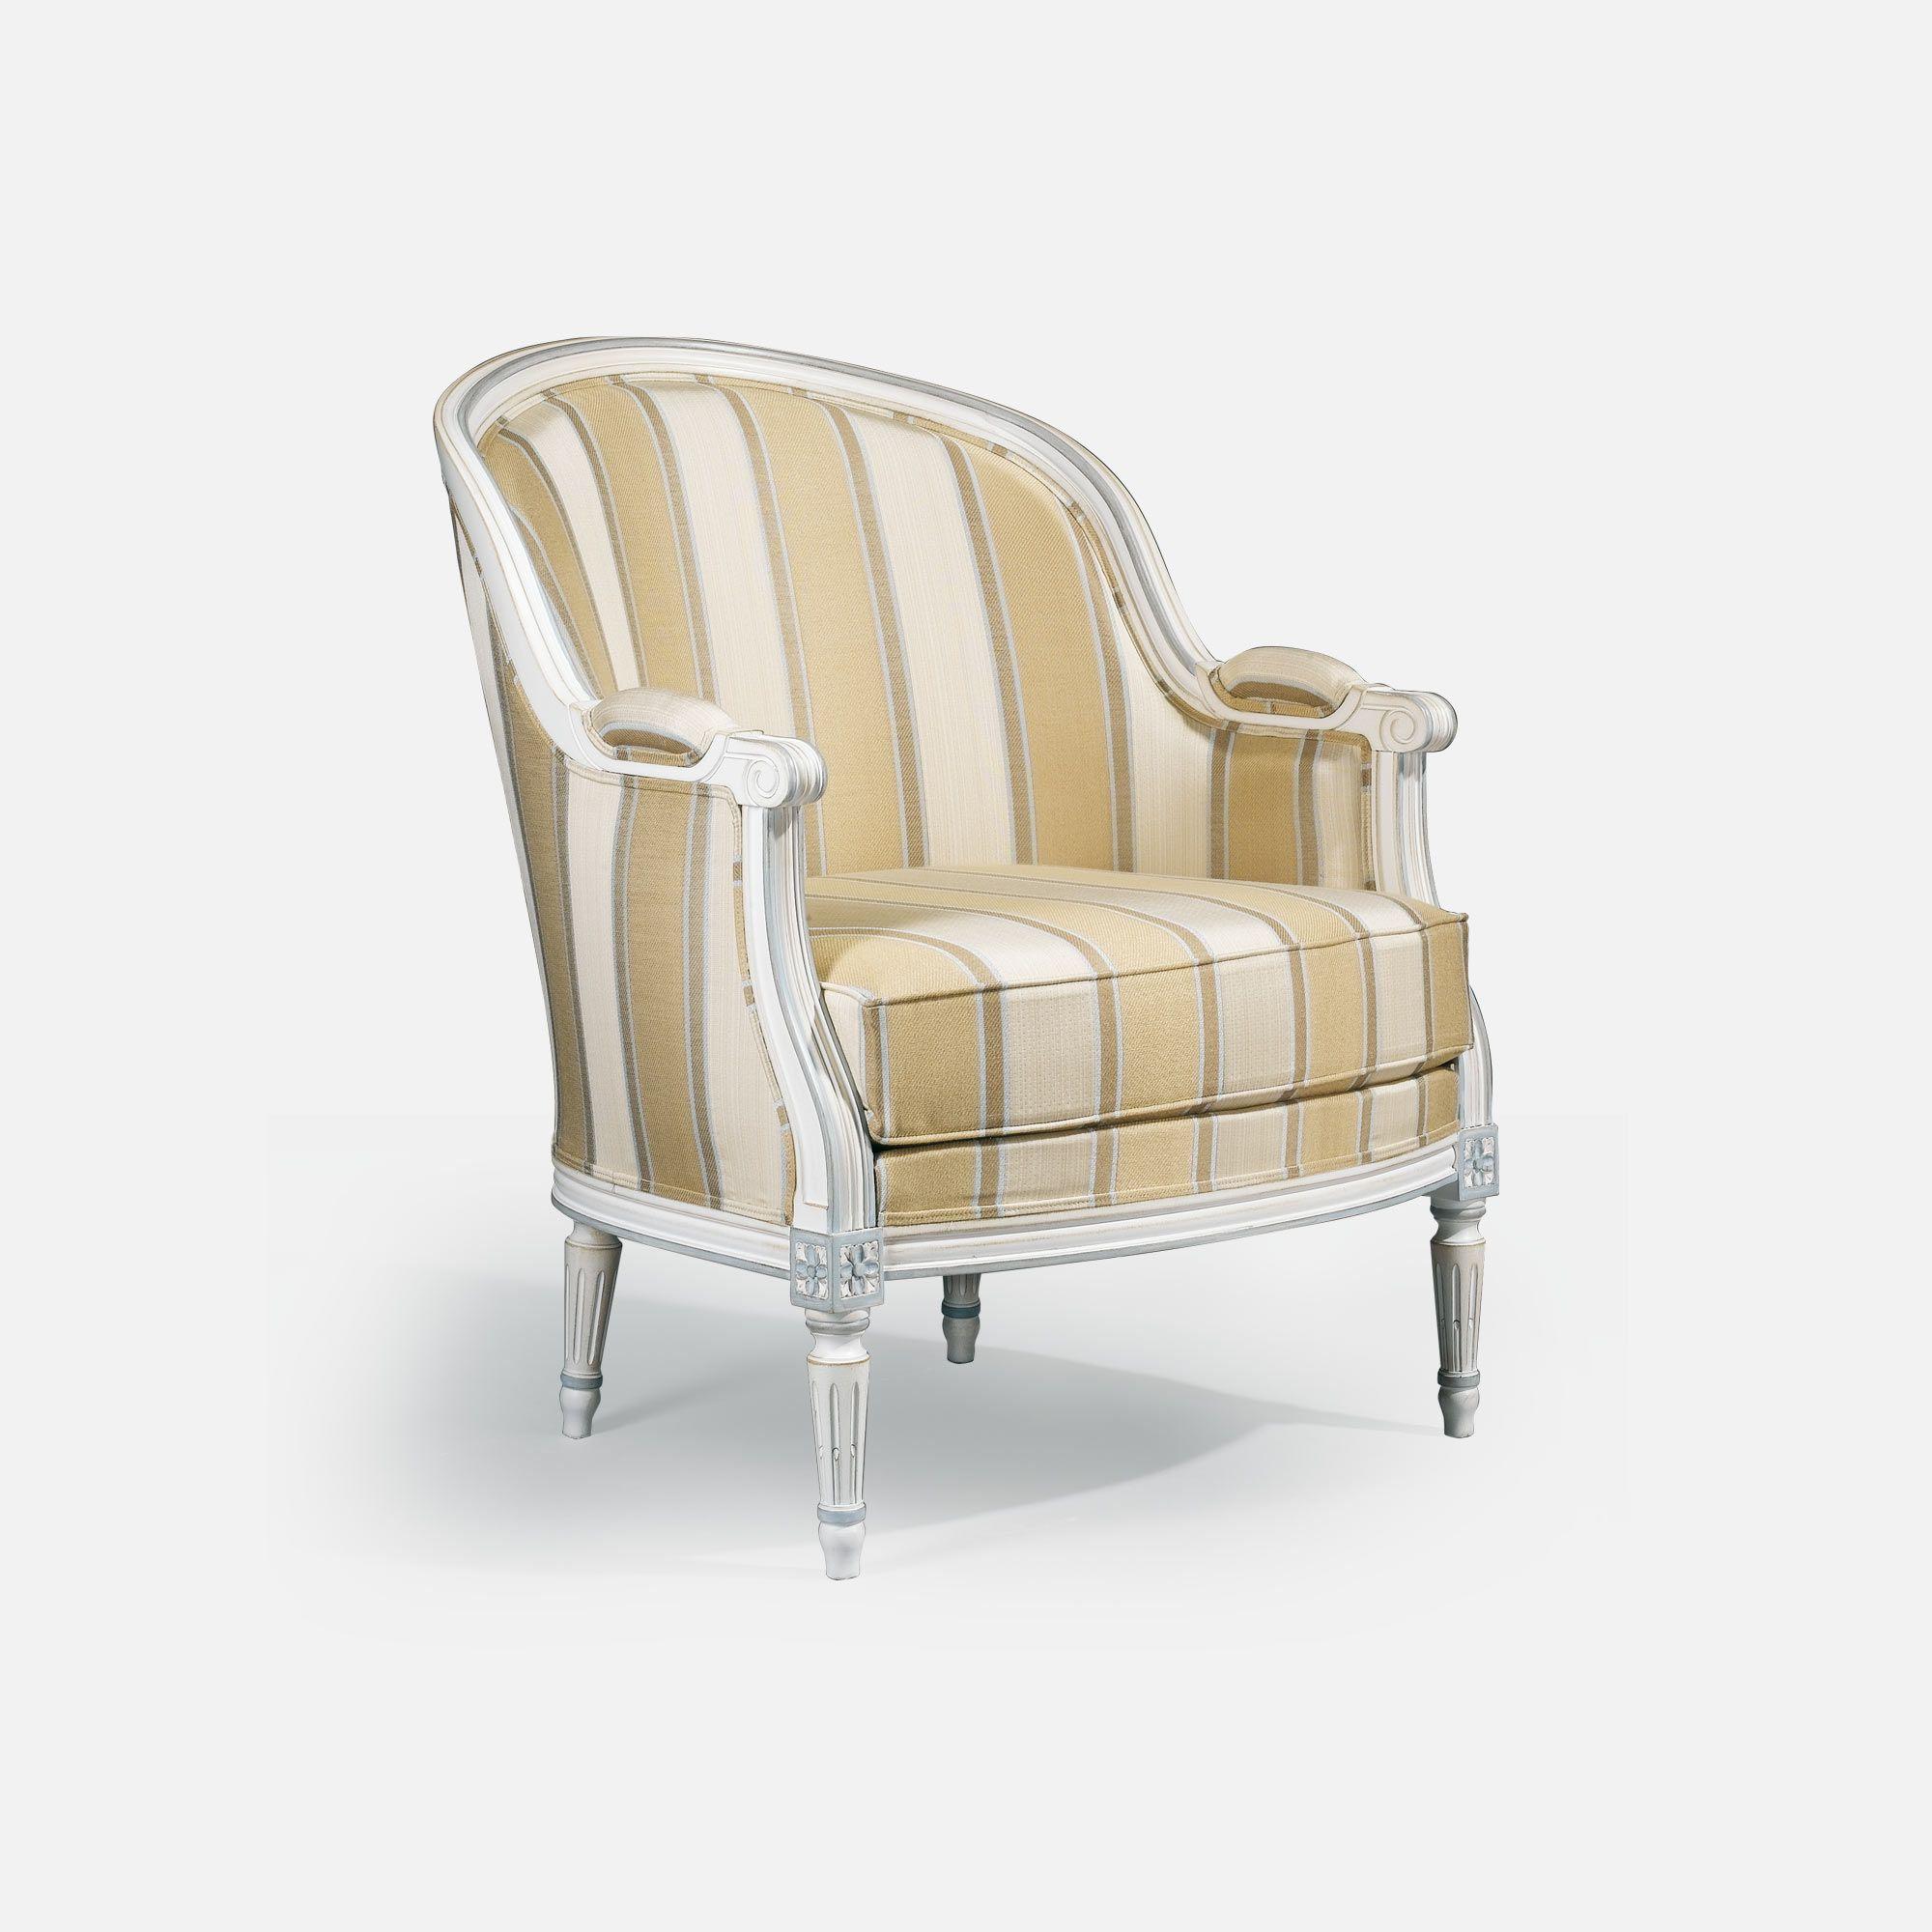 Bergere chair for Hotel restaurant bar Louis XVI Gondole